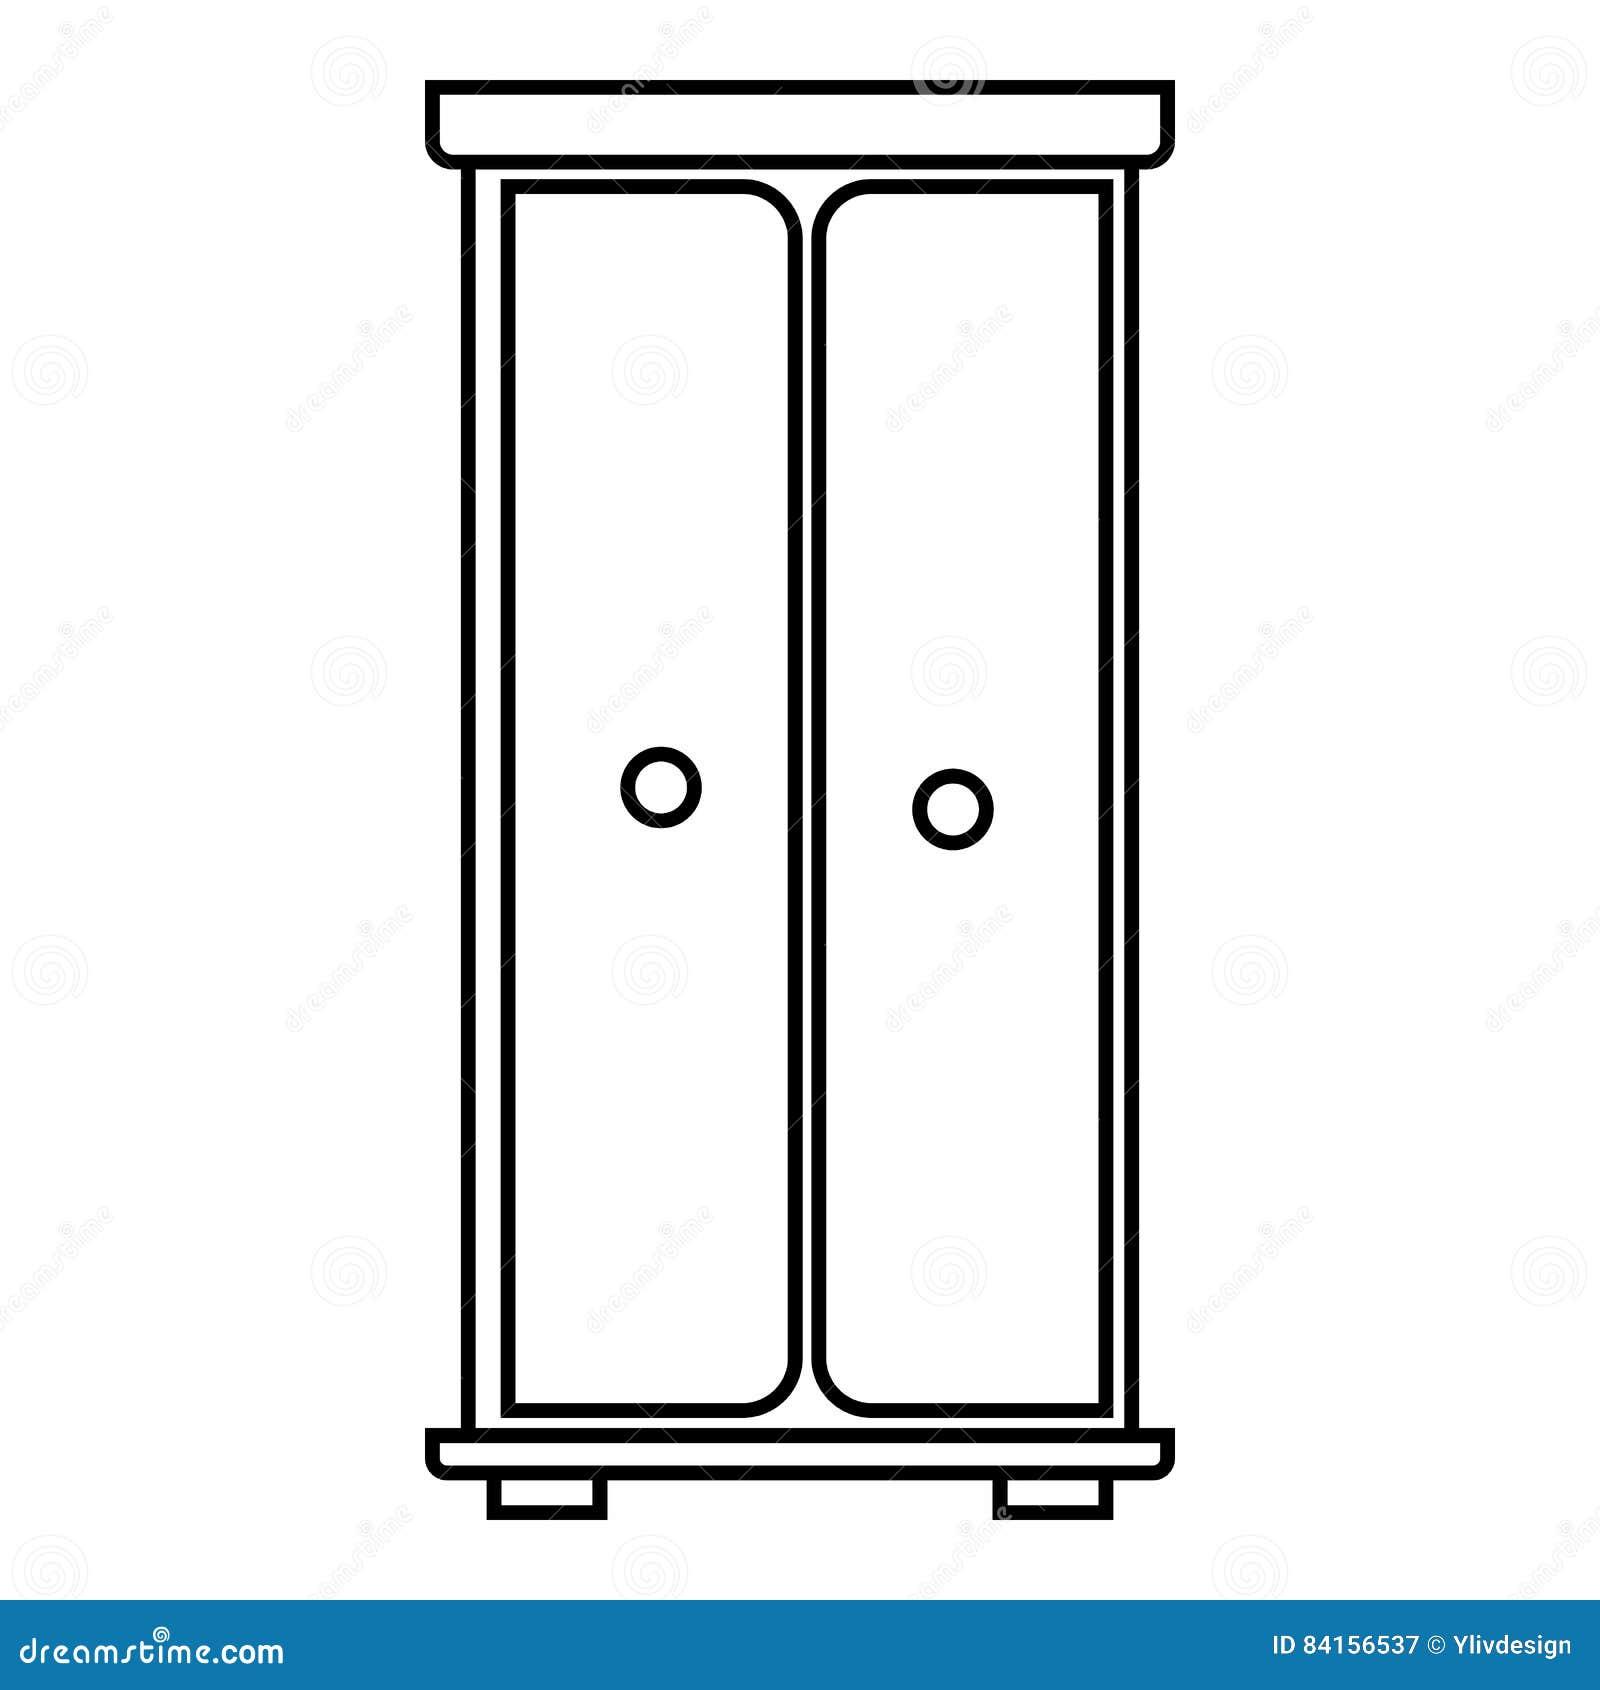 Wardrobe Icon Outline Style Stock Vector Illustration